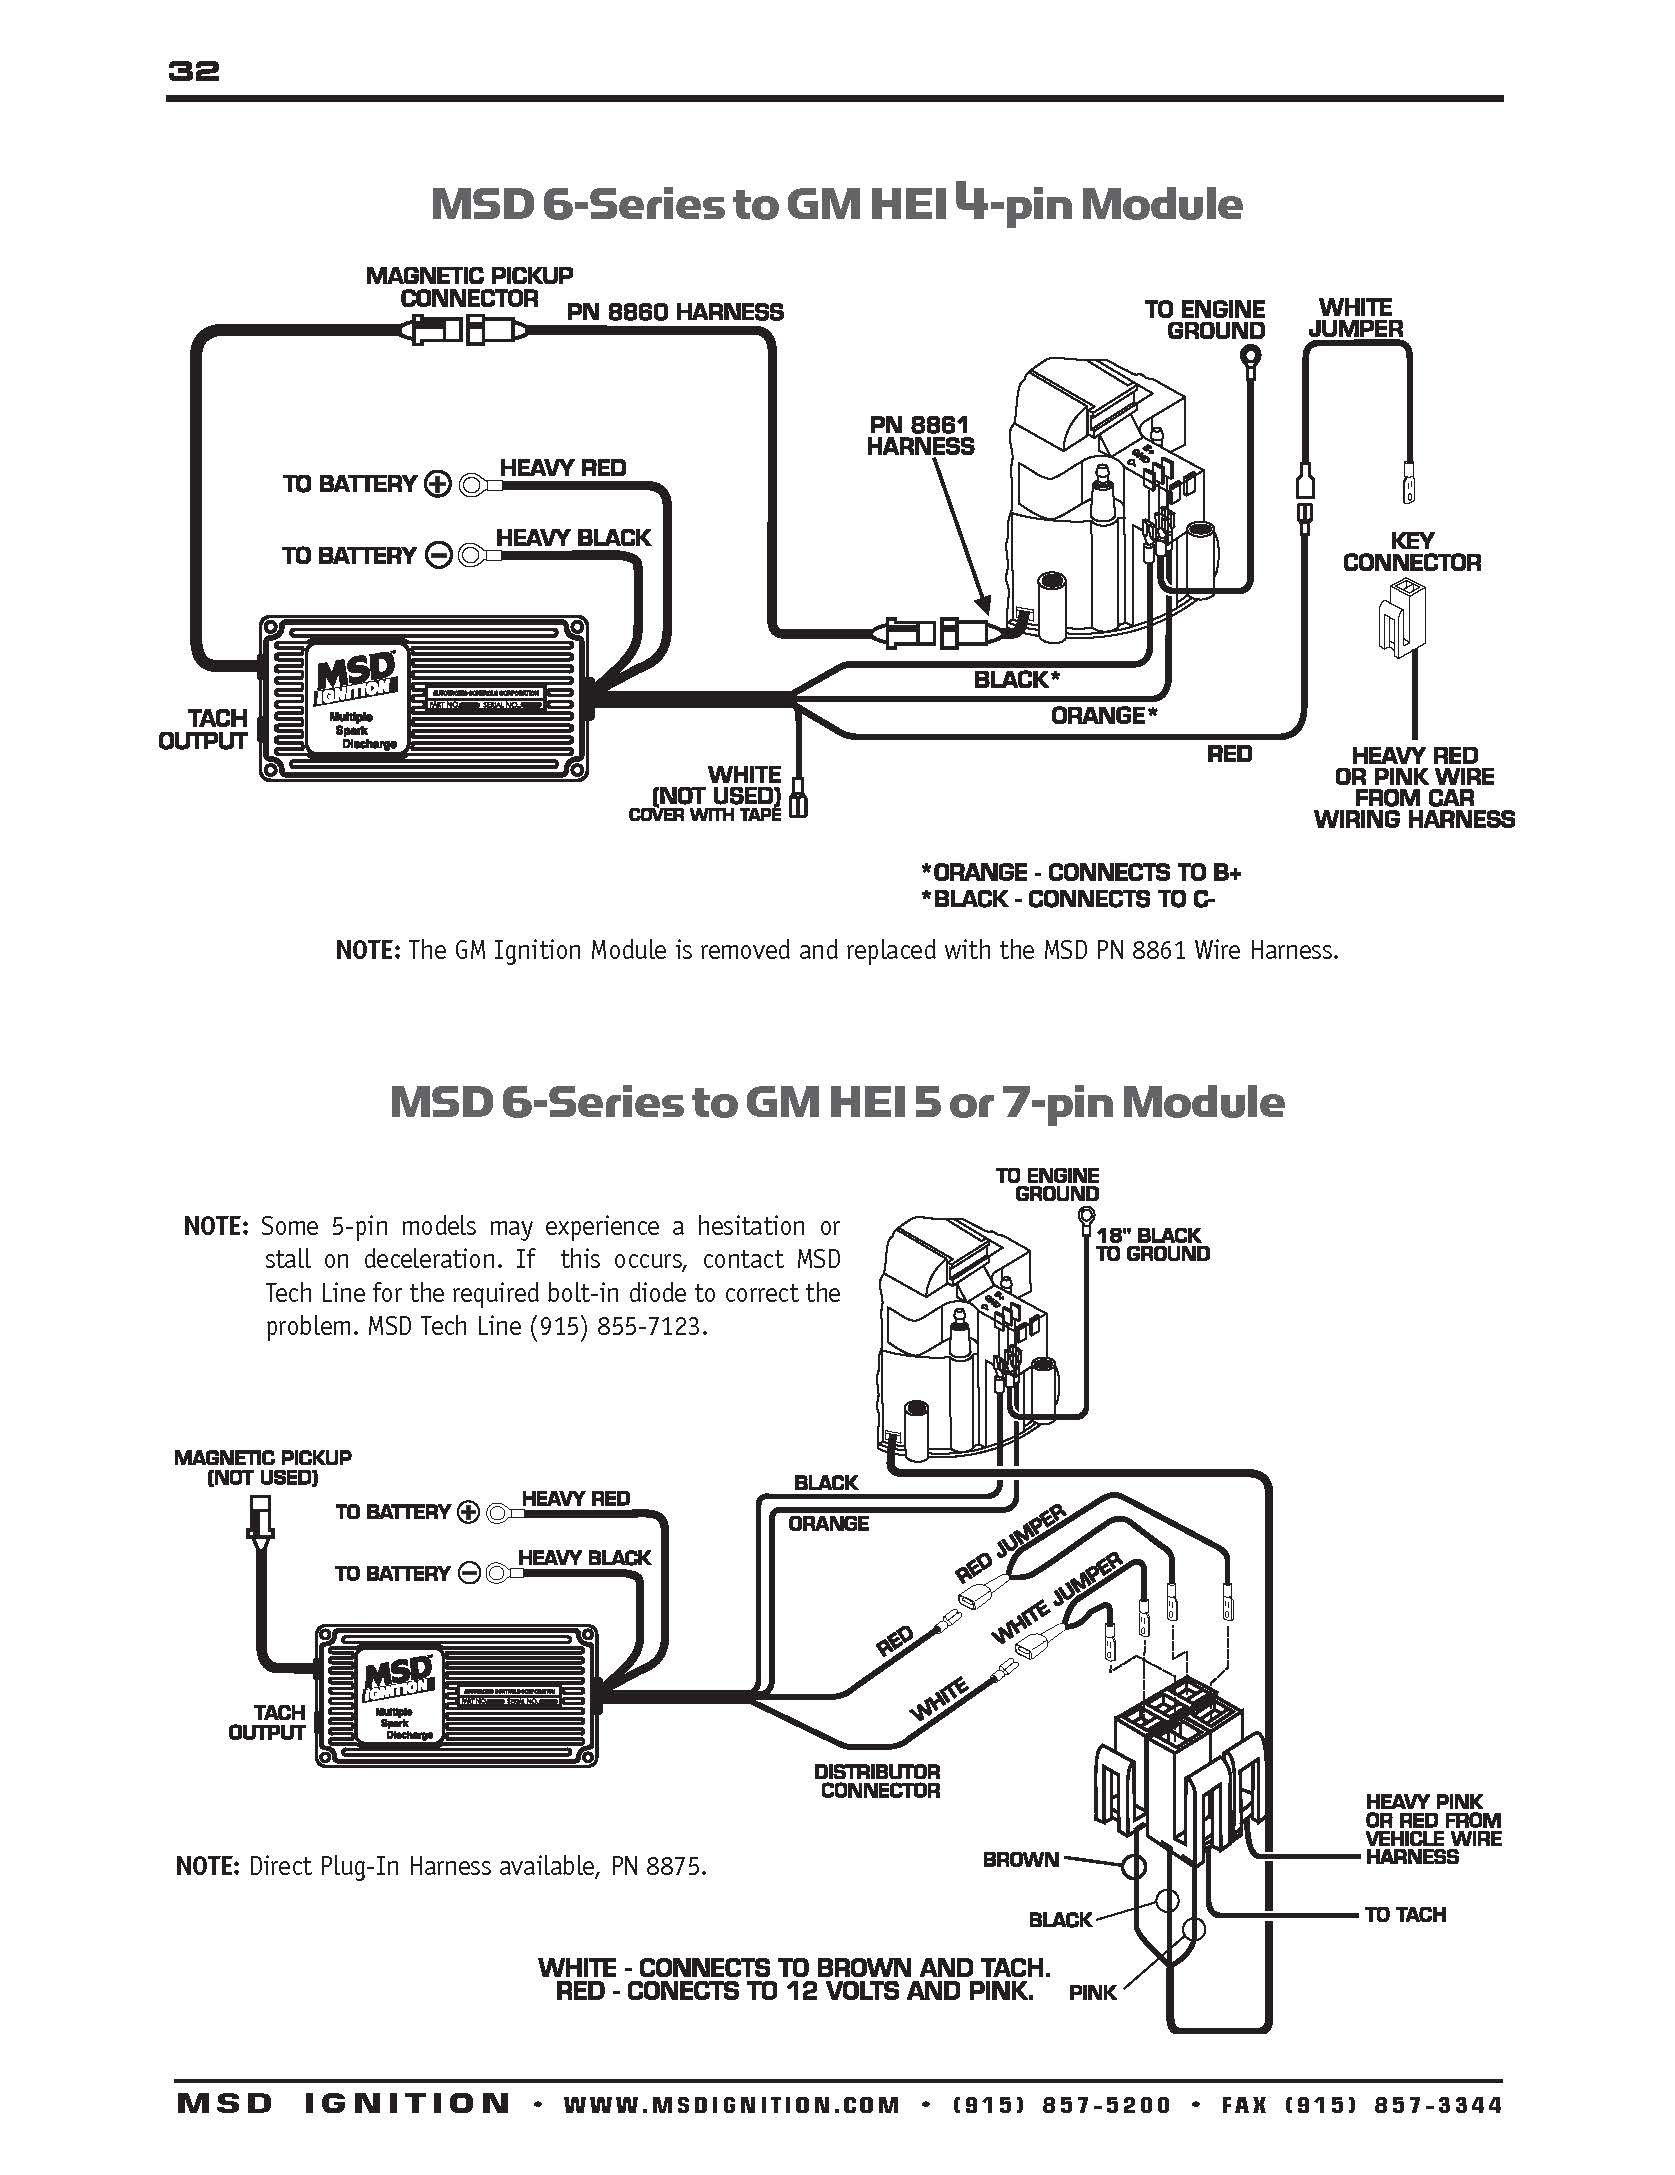 [SCHEMATICS_4HG]  VO_1360] Msd Ignition Box Wiring Diagram Download Diagram | Cadillac Hei Distributor Wiring Diagram |  | Iness Strai Usnes Vira Mohammedshrine Librar Wiring 101